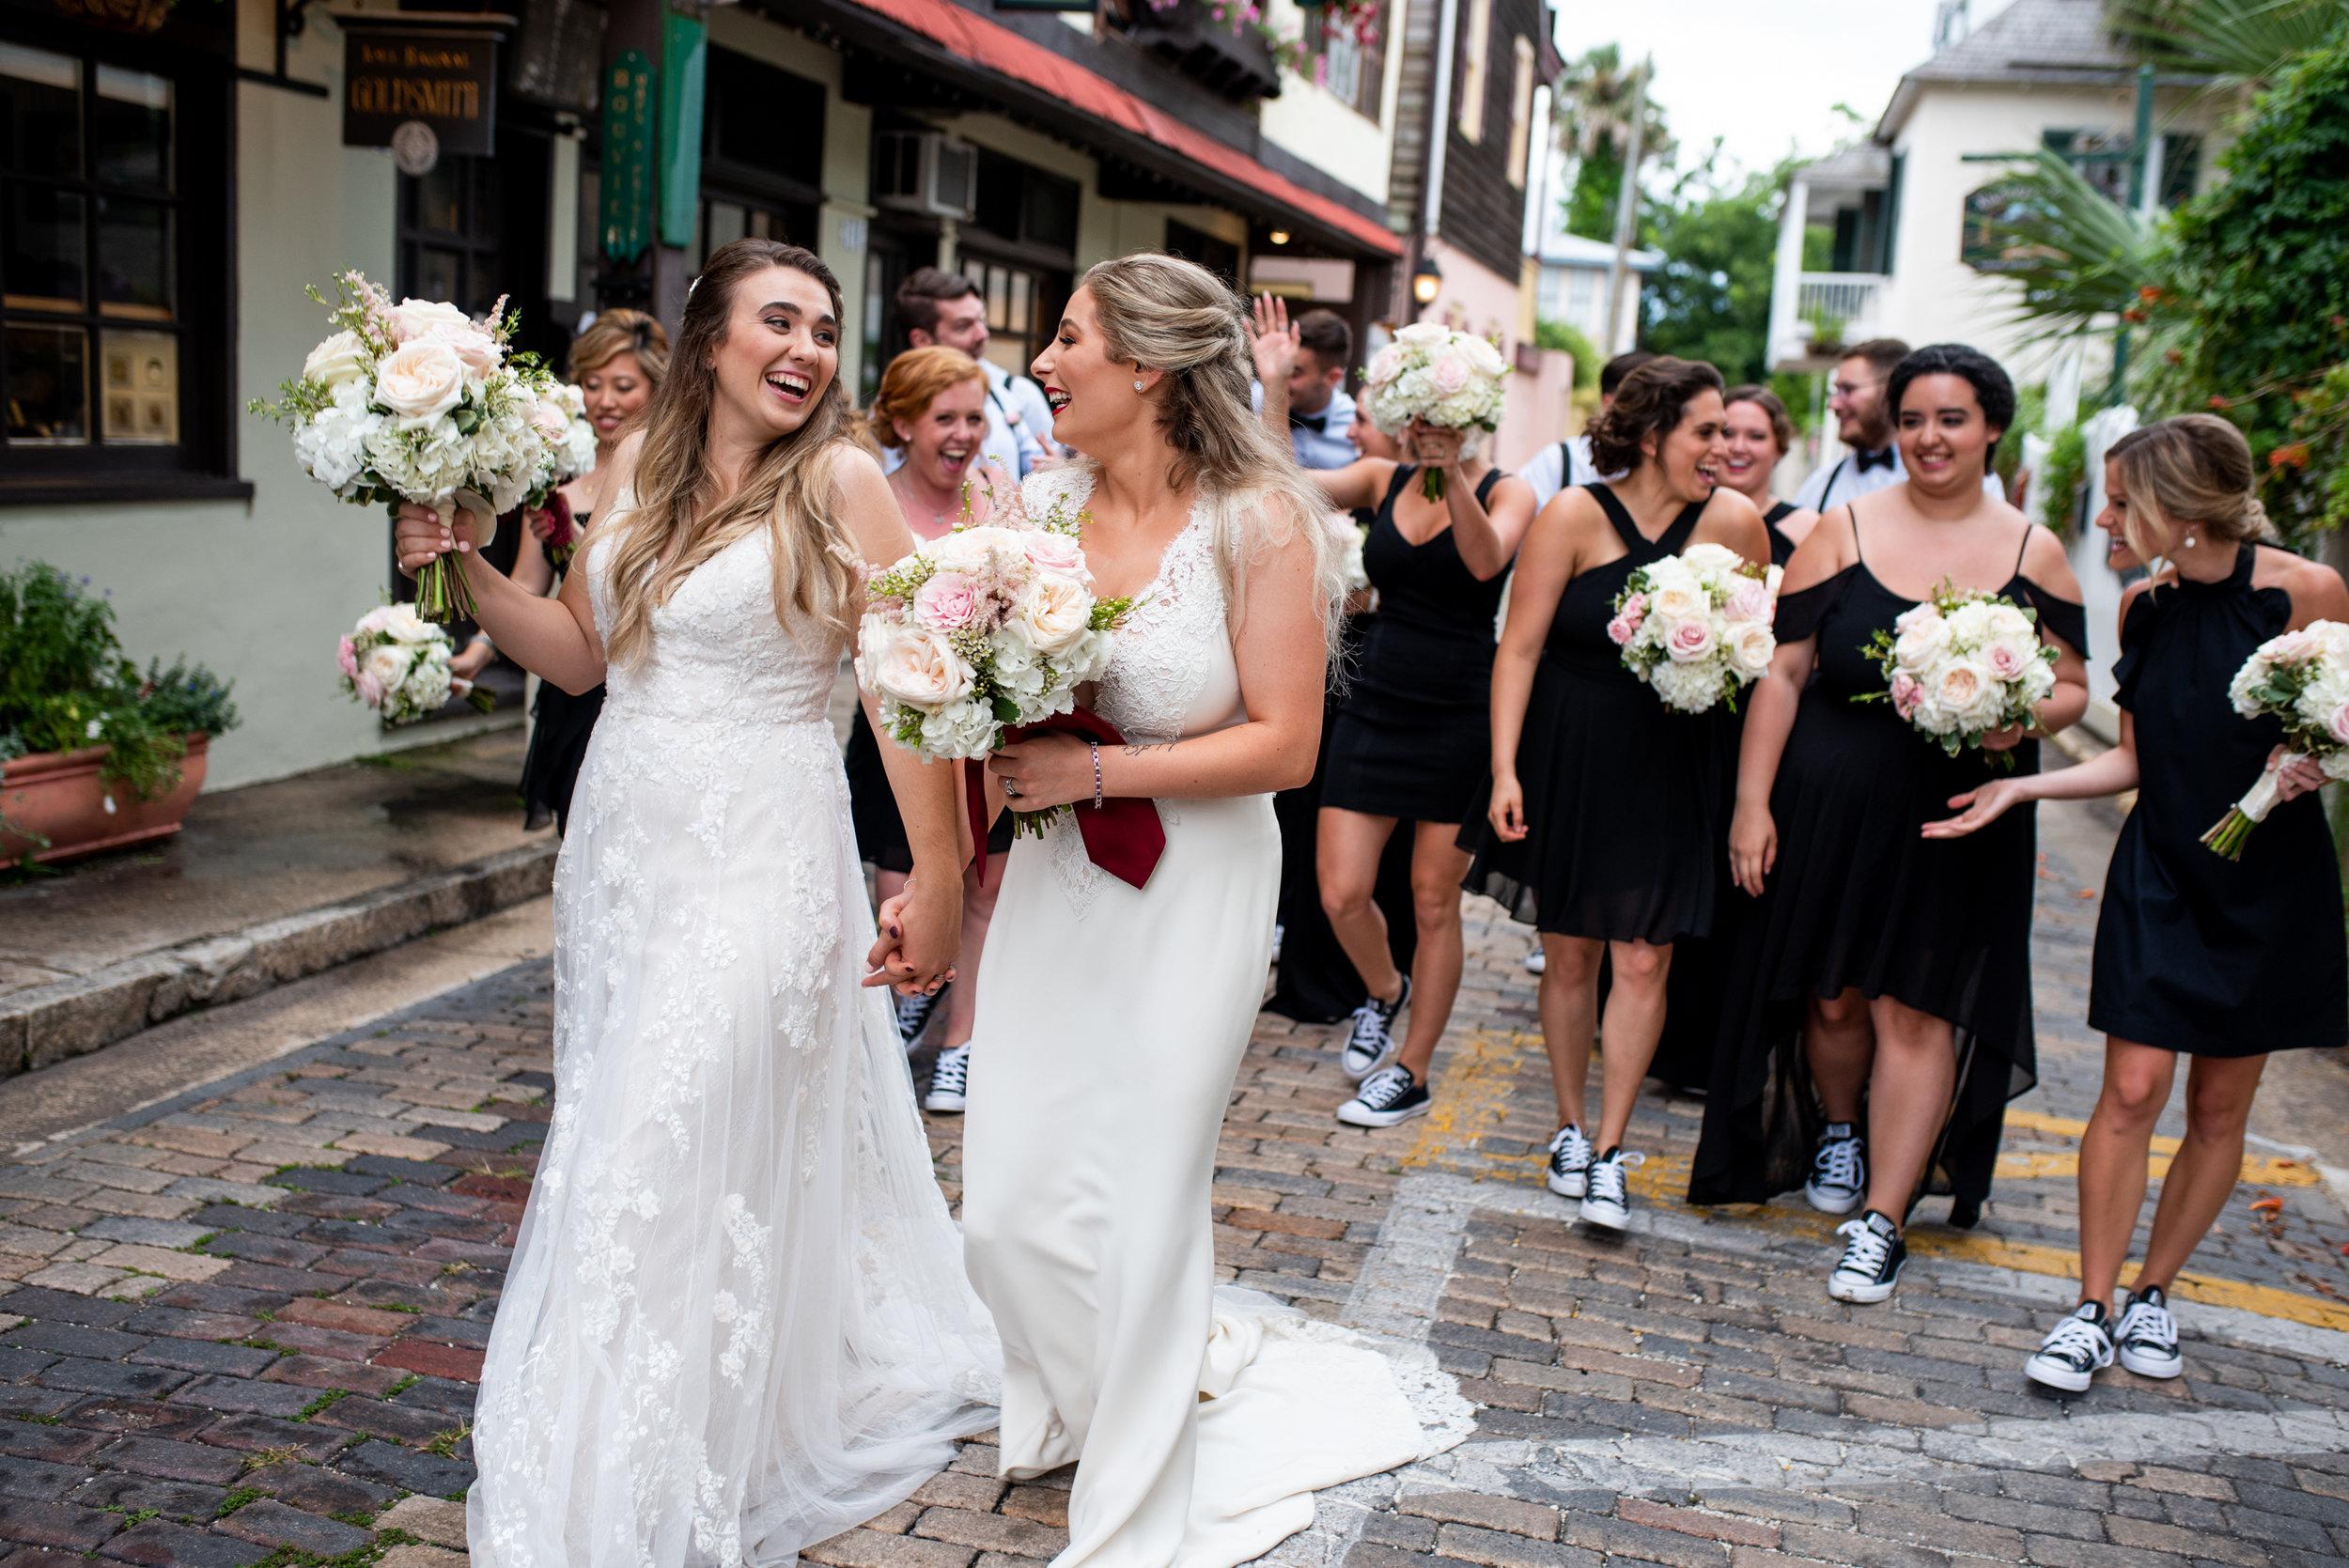 st-augustine-photographer-st-augustine-gay-wedding-sam-sex-wedding-photographer-sarah-annay-photography-white-room-weddings-37.jpg